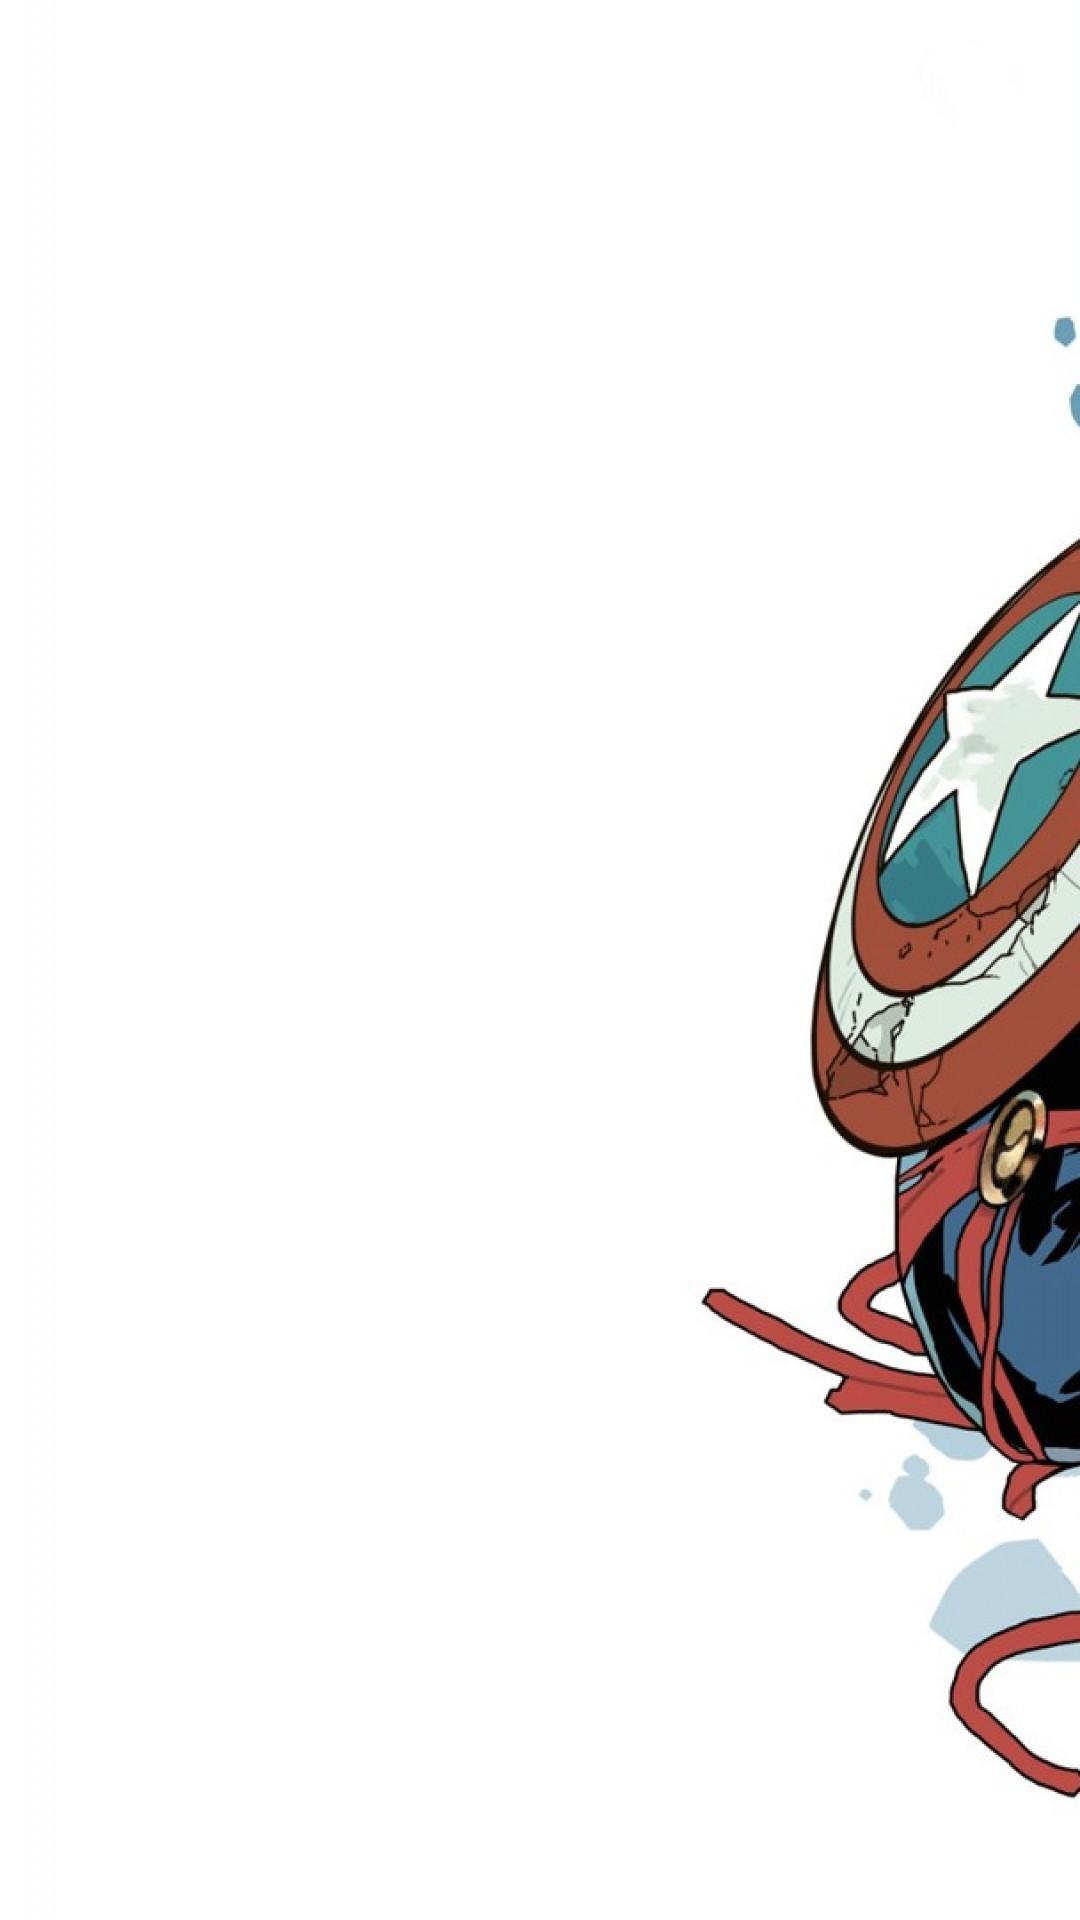 Res: 1080x1920, iPhone 7 Plus Captain Marvel Wallpaper